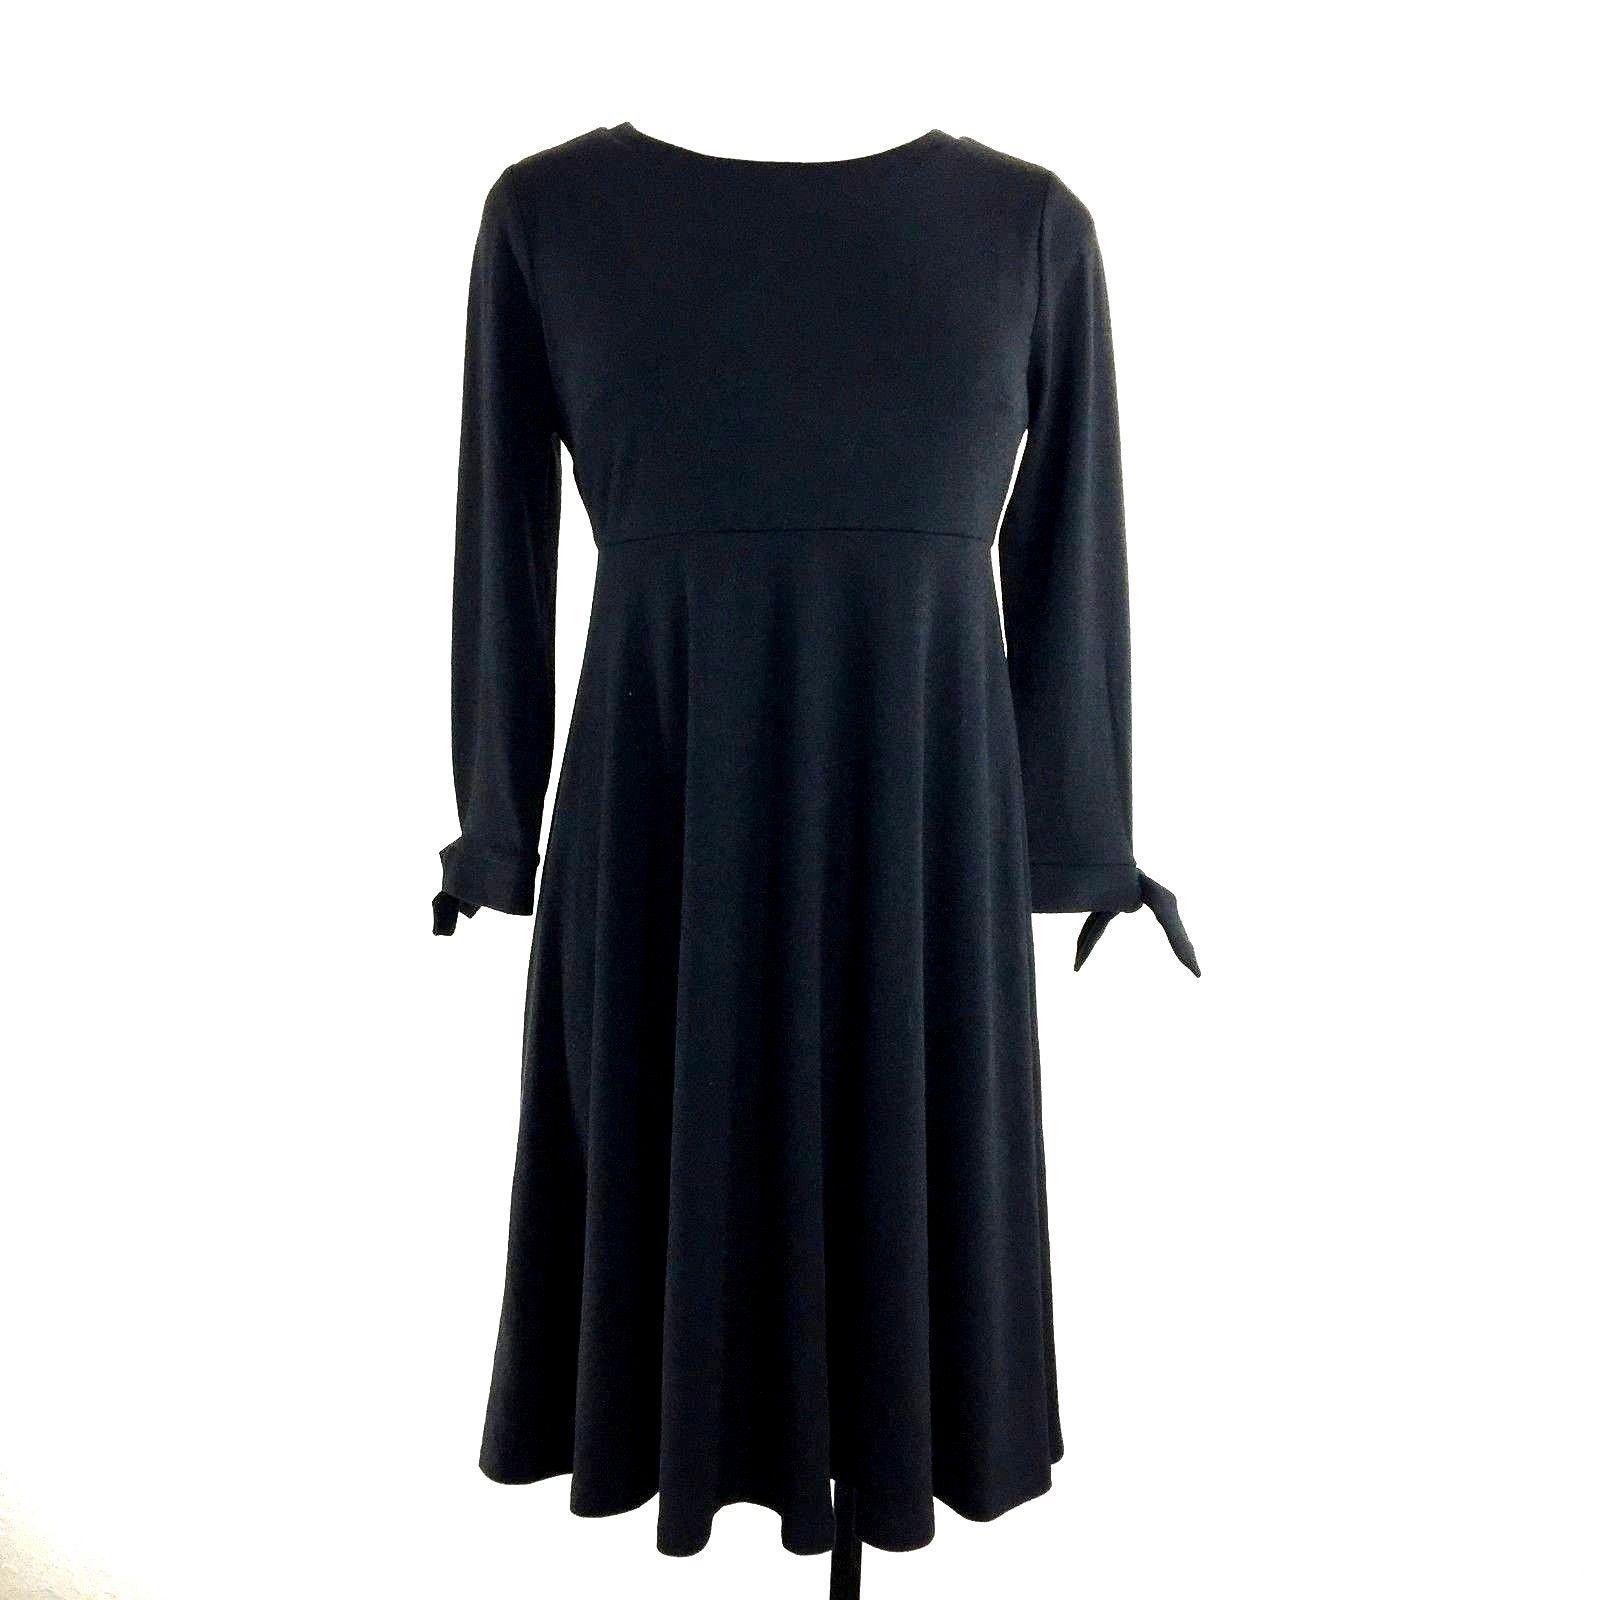 5e9755e5ea754 NEW Ann Taylor LOFT 2 Maternity Small Dress Black Bow Tie Sleeve Washable  Work - $24.95